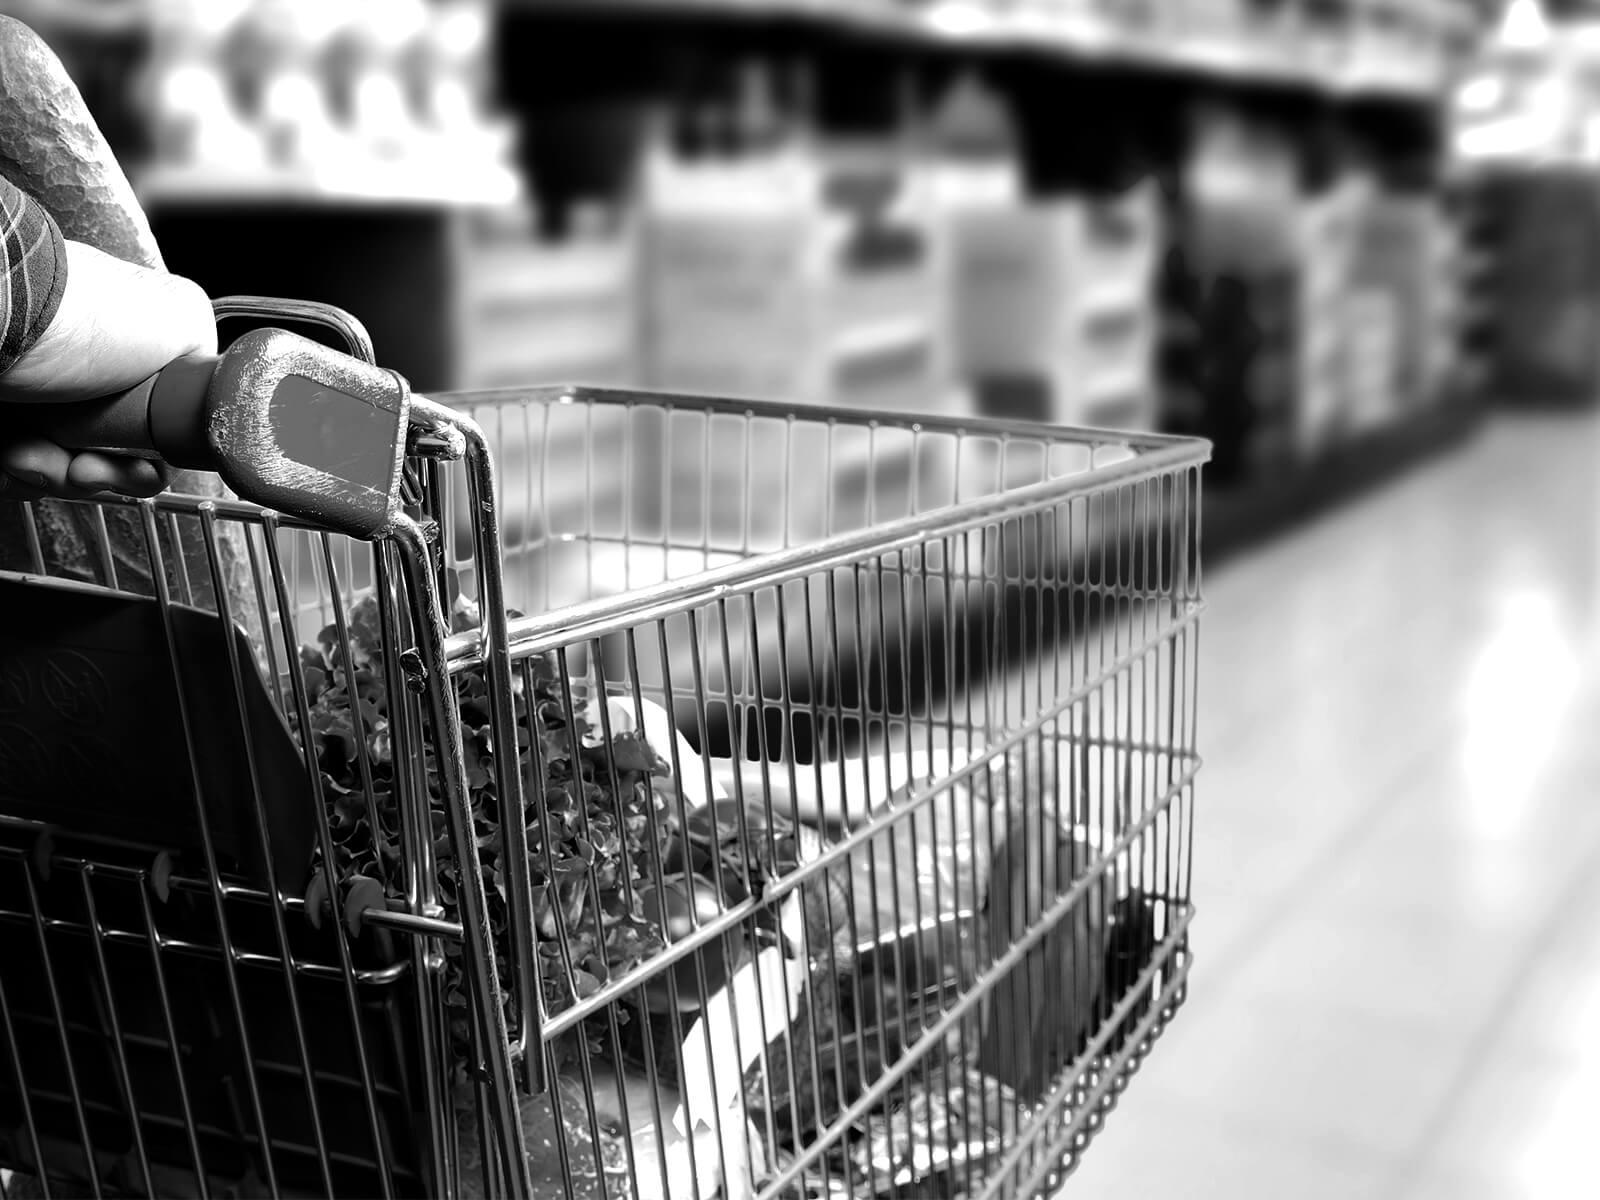 Top 5 marketing priorities for retailers in Q4 2020